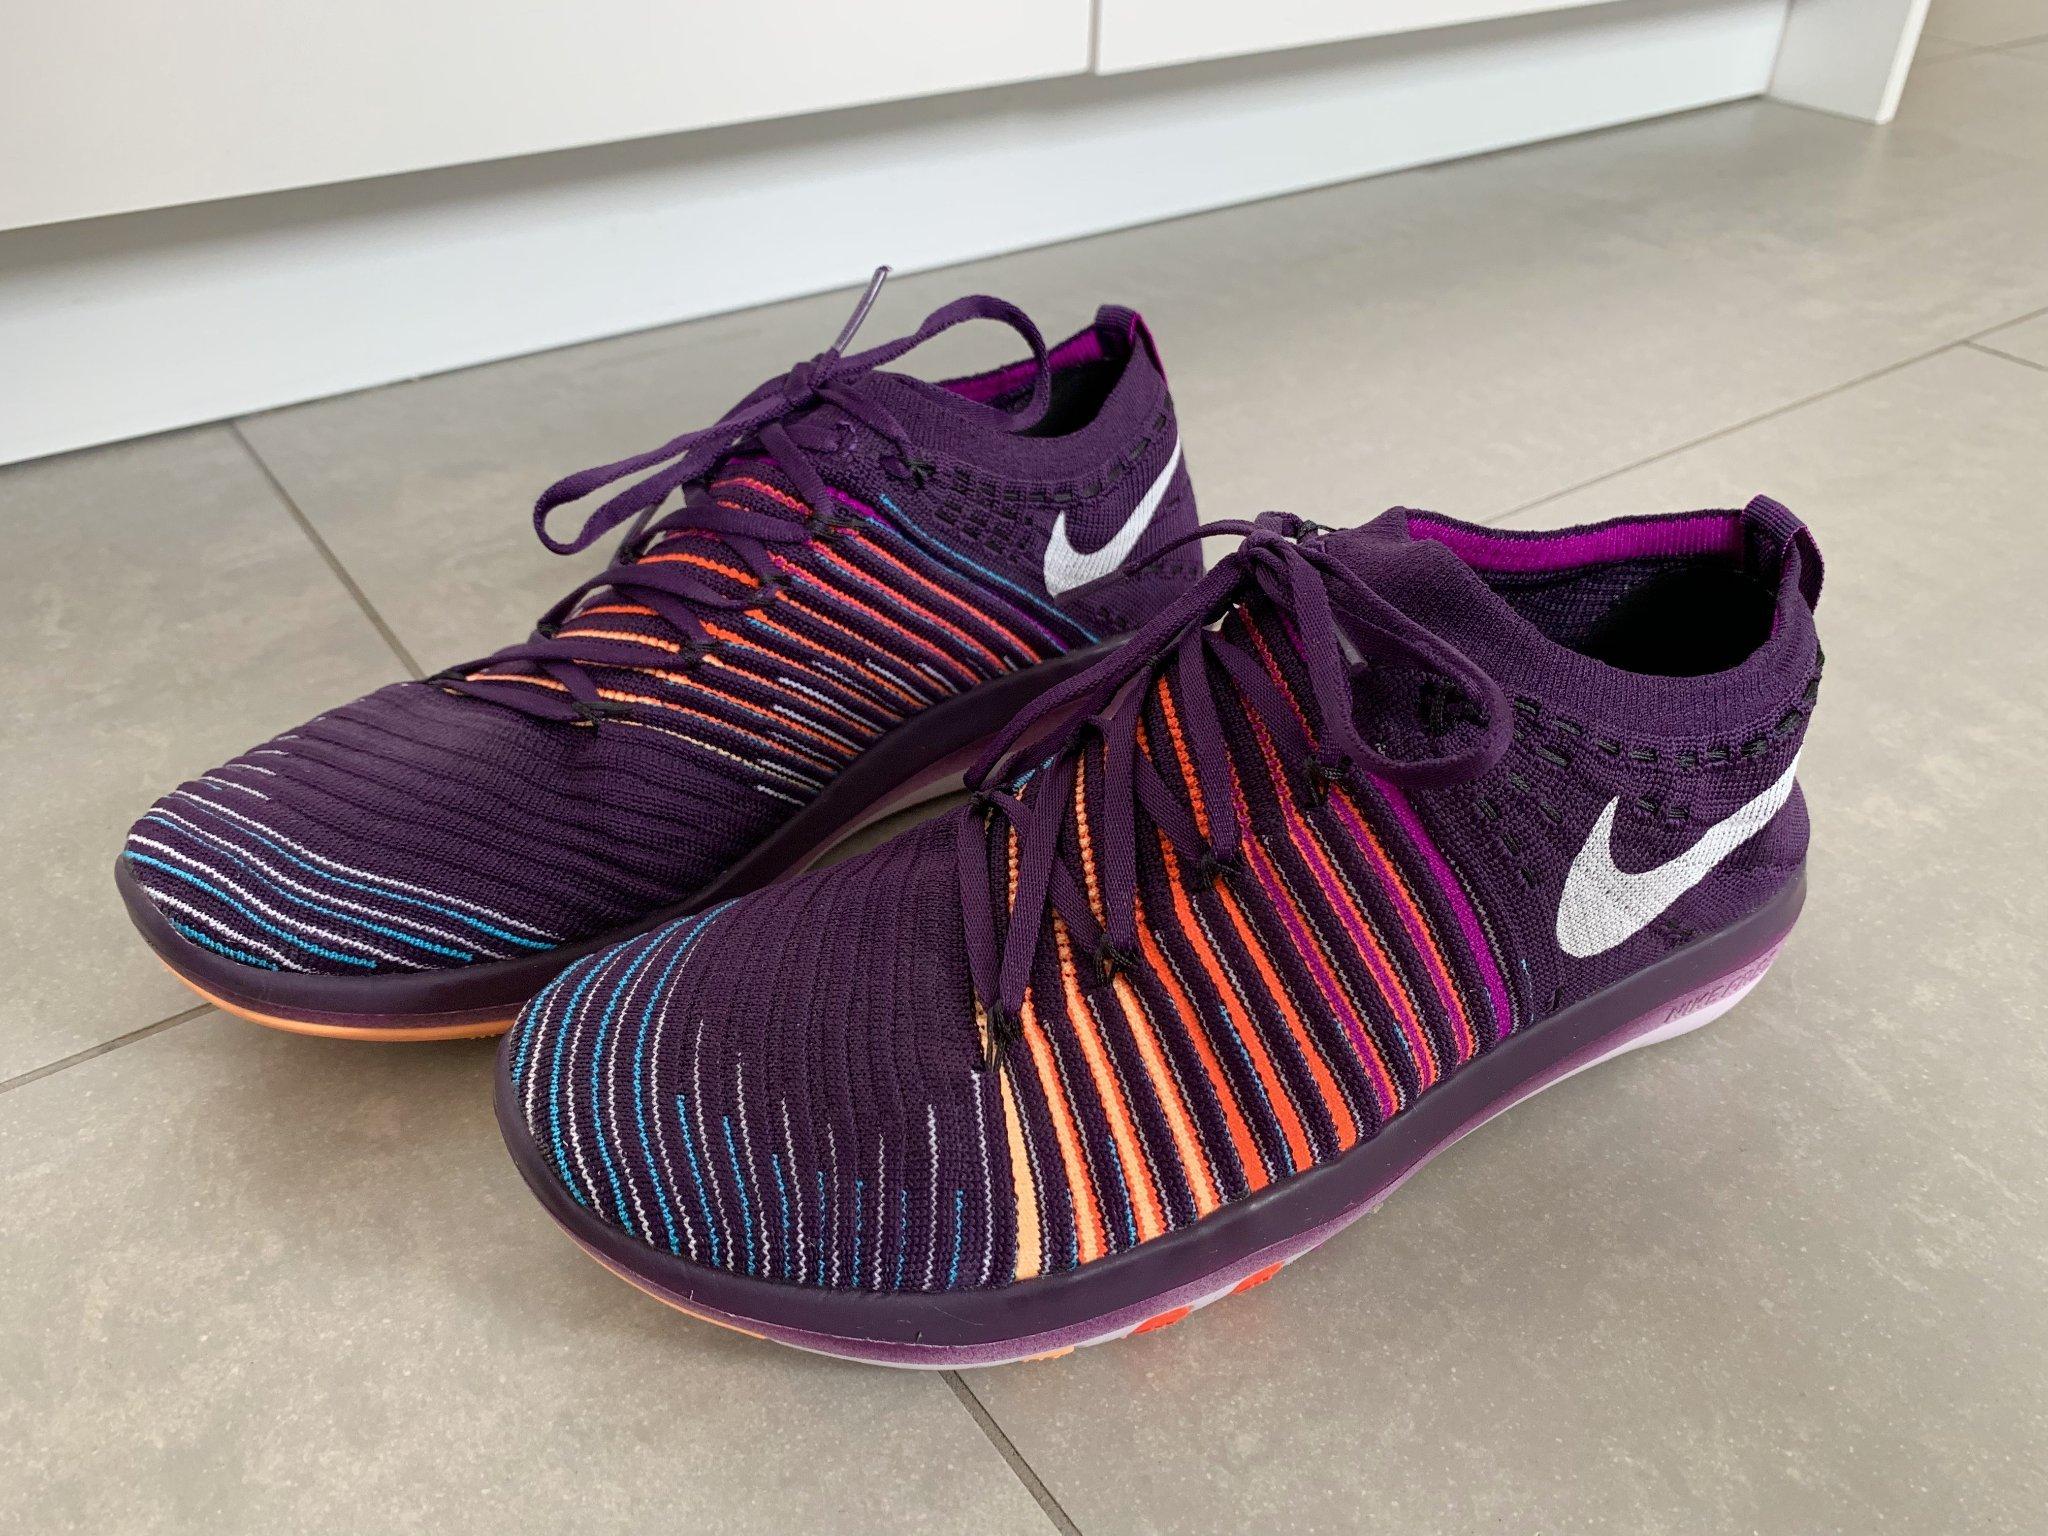 39 Nya Nike Gymnastikskor Strumps348821175? Skor Köp